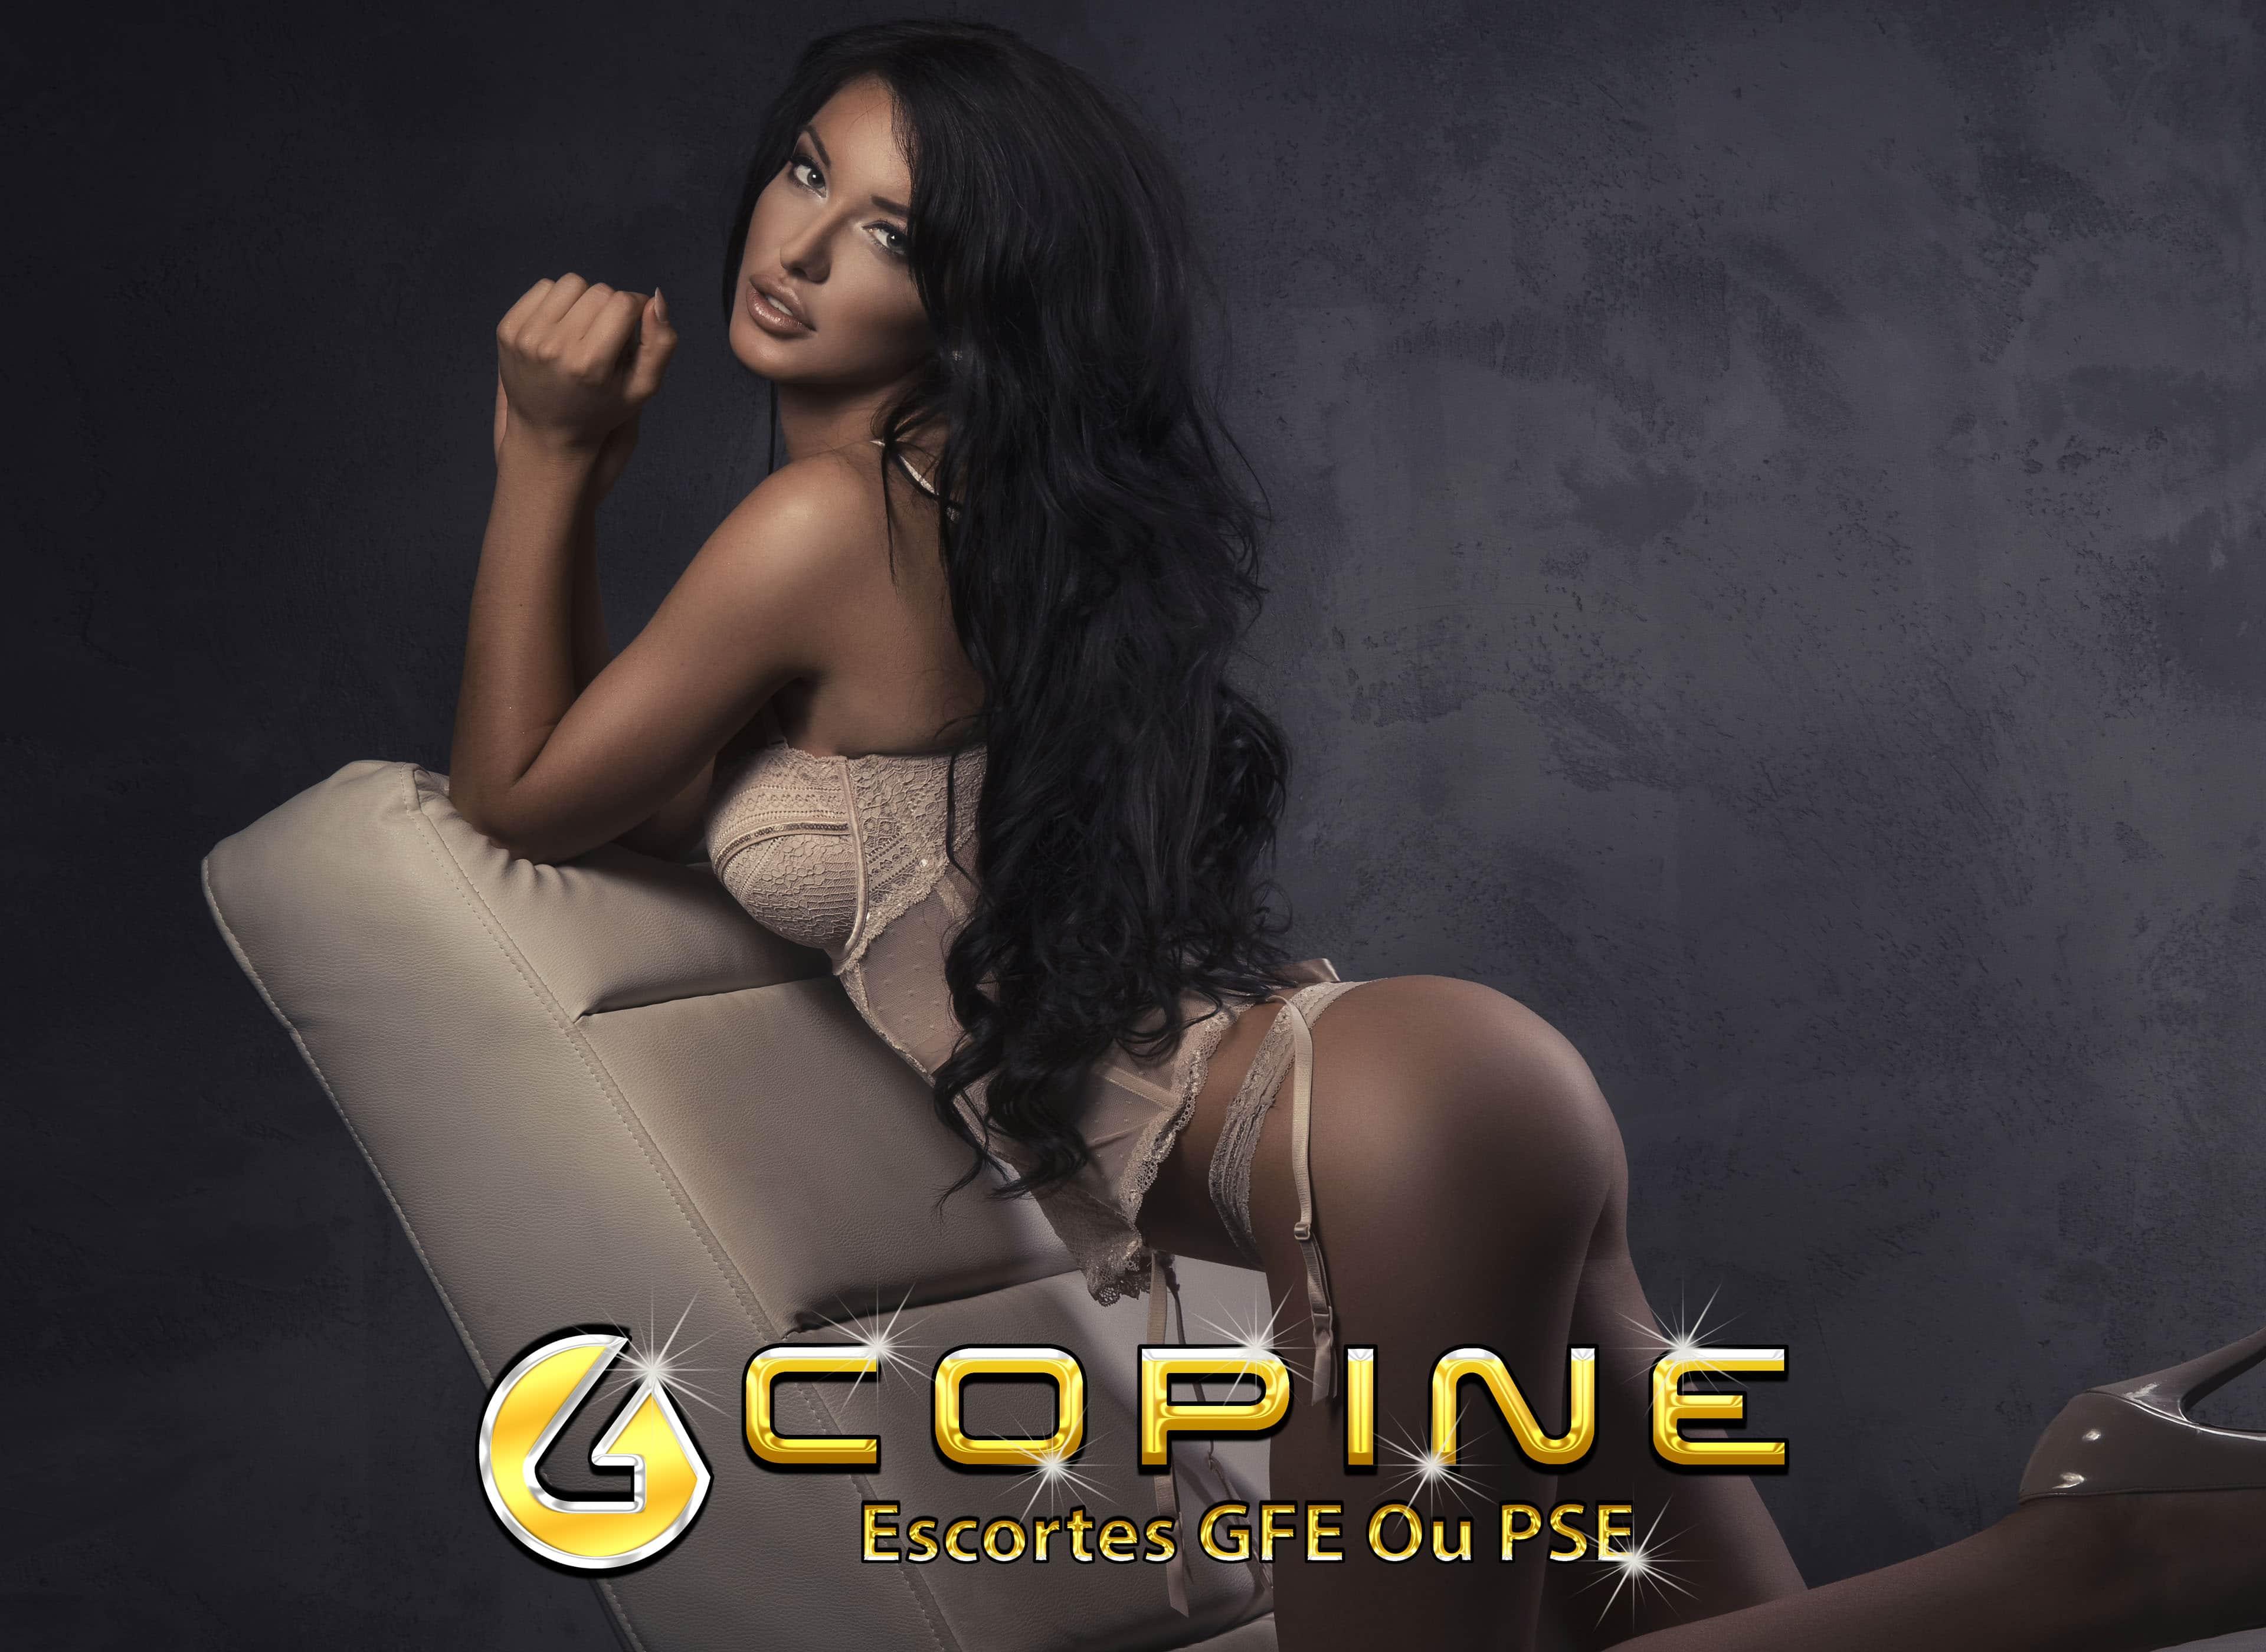 Absolu-Copine-Division-Escorte-Experience-Petite-Amie-GFE-PSE-VIP-Elite-FR-4K